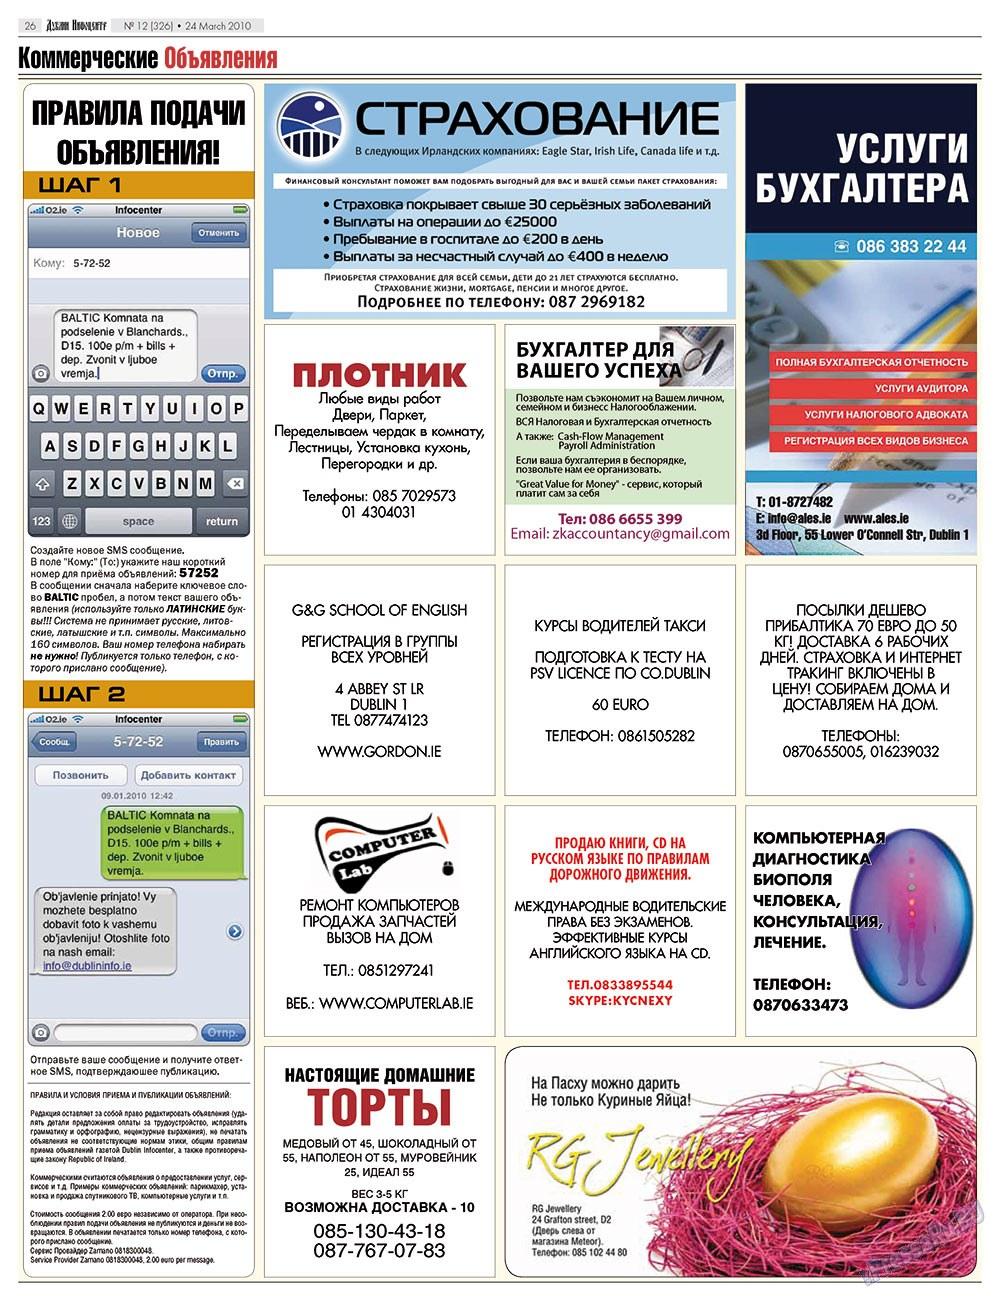 Дублин инфоцентр (газета). 2010 год, номер 12, стр. 26